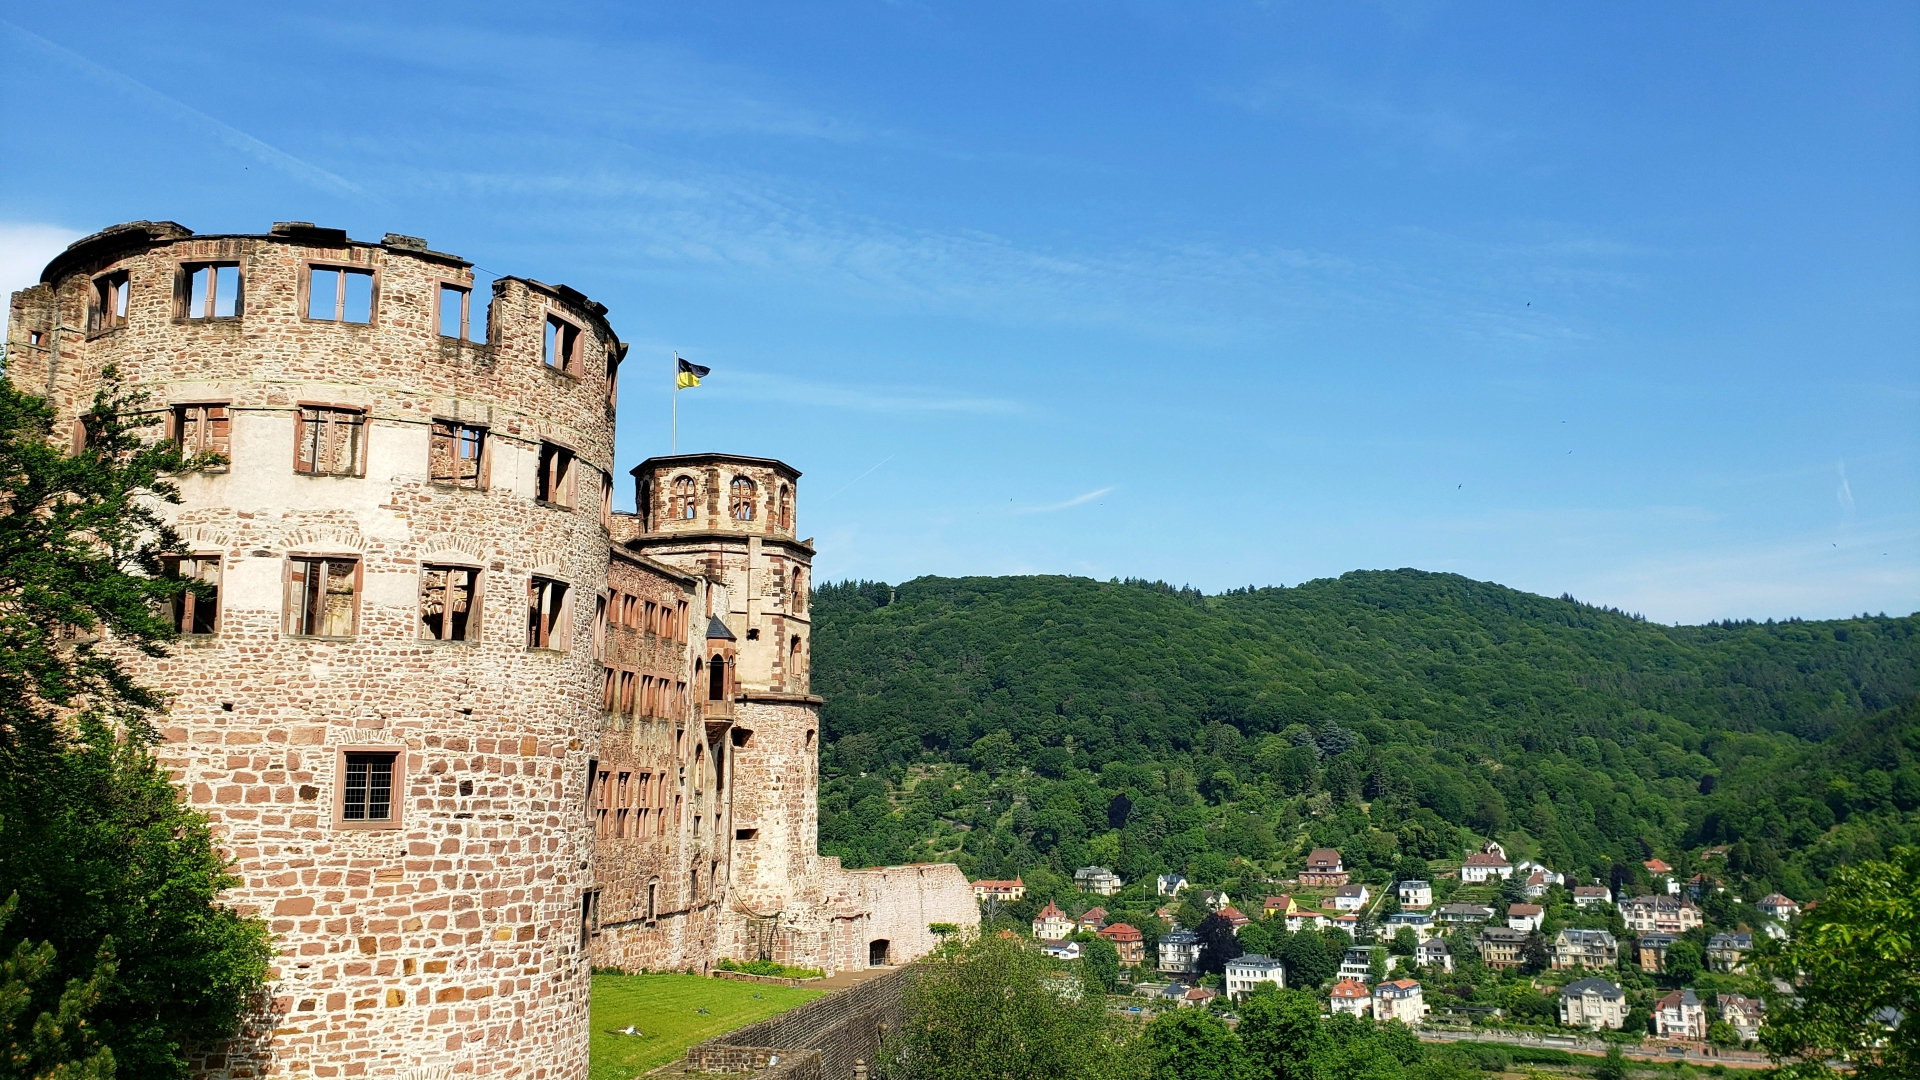 Heidelberg, Heidelberger Schloss, unsplash.com, Steven He